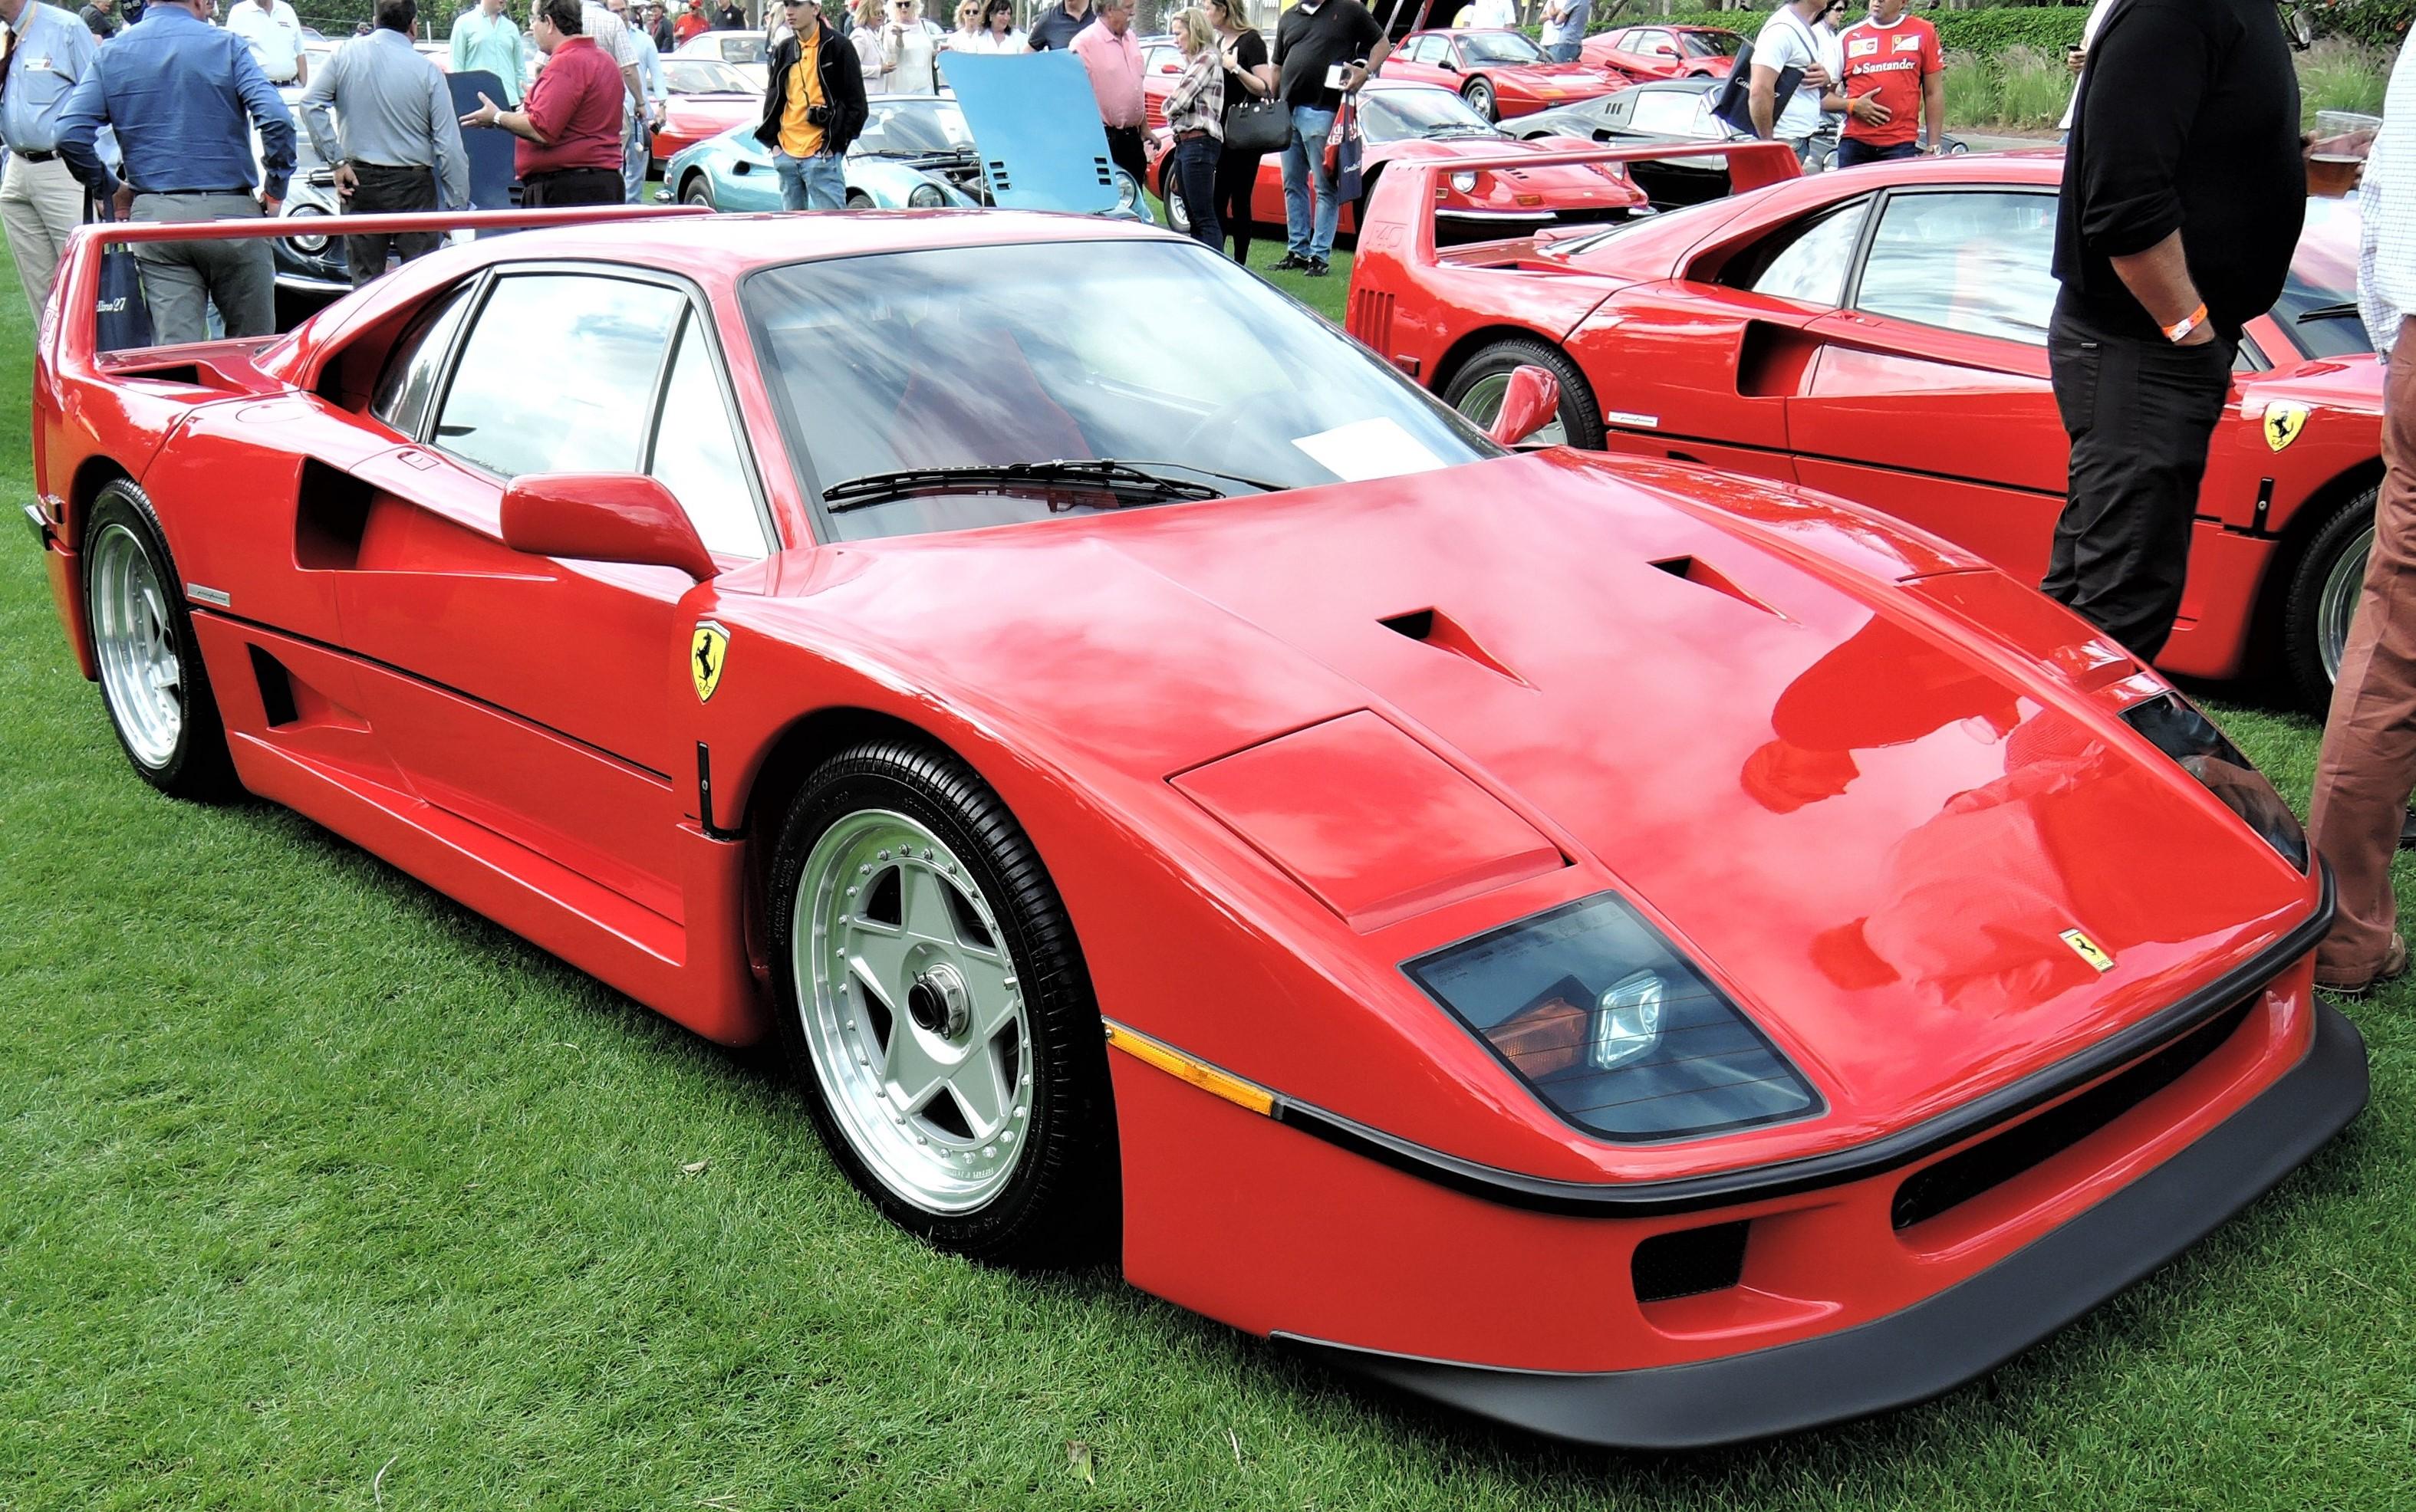 red 1992 Ferrari F40; Sn 92189 - Cavallino 2018 Concours